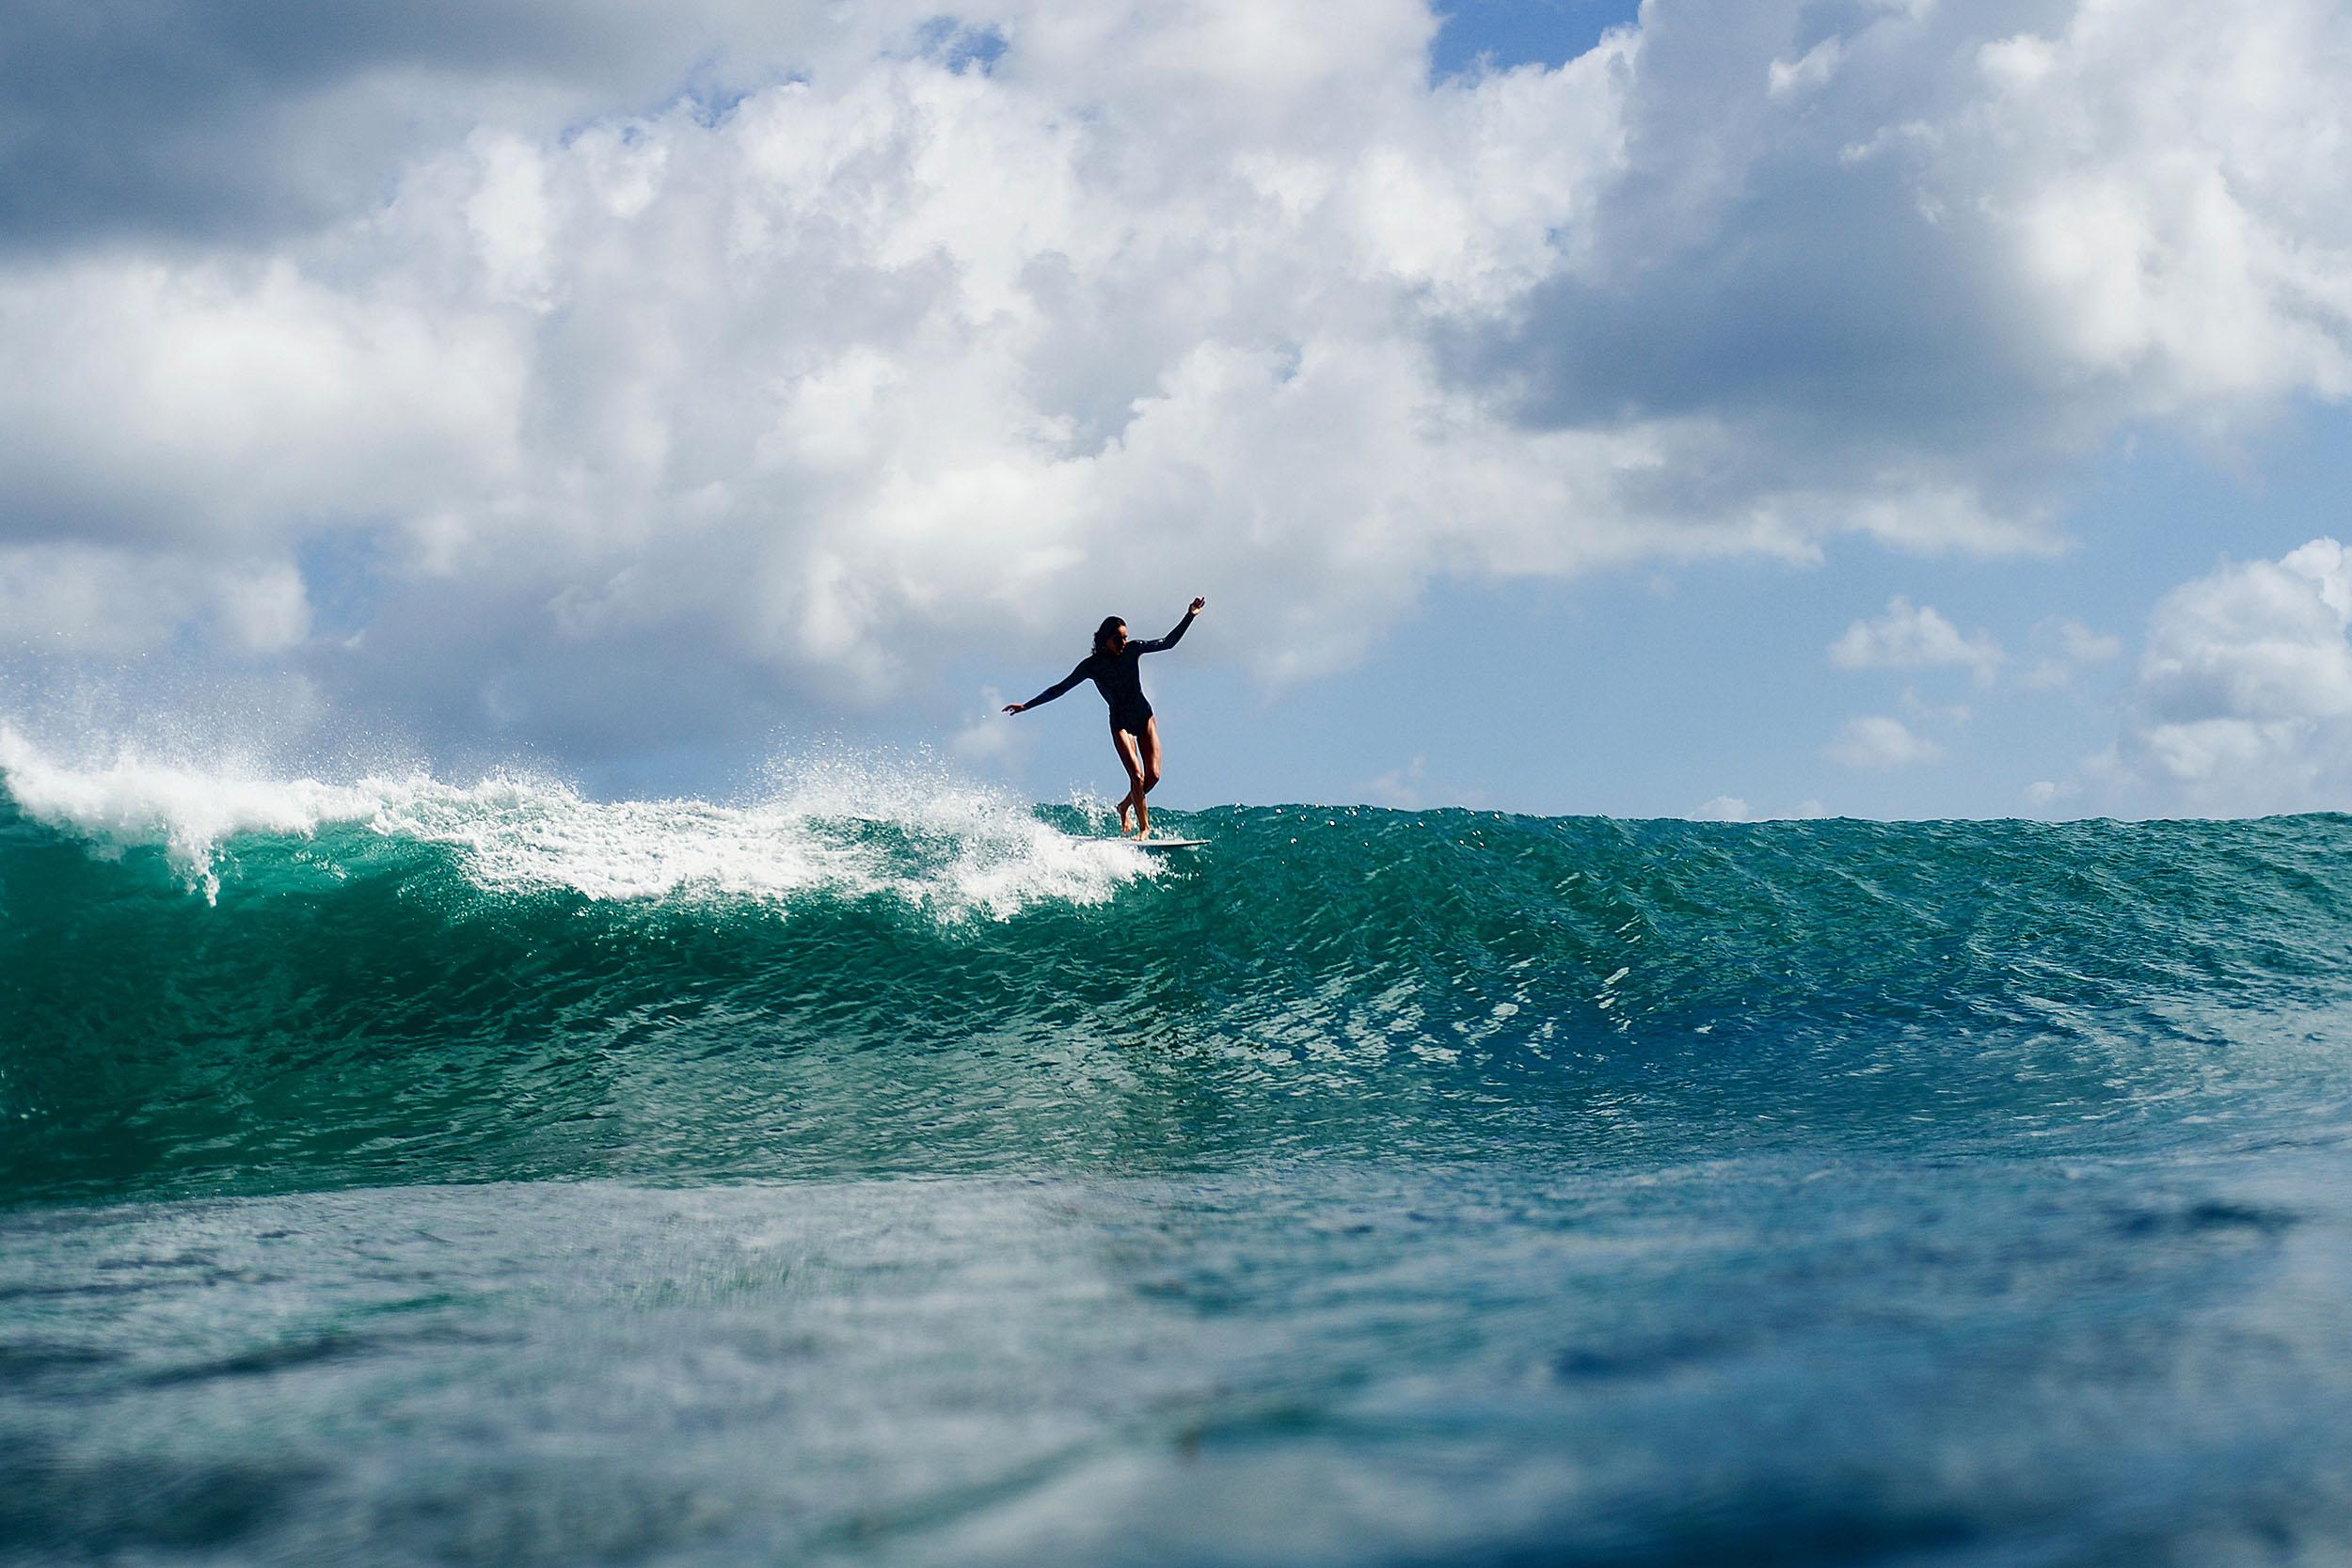 a165536239f1 California's 10 Best Surfing Campsites · Women's Surfable Swimwear  Spotlight: O'Neill